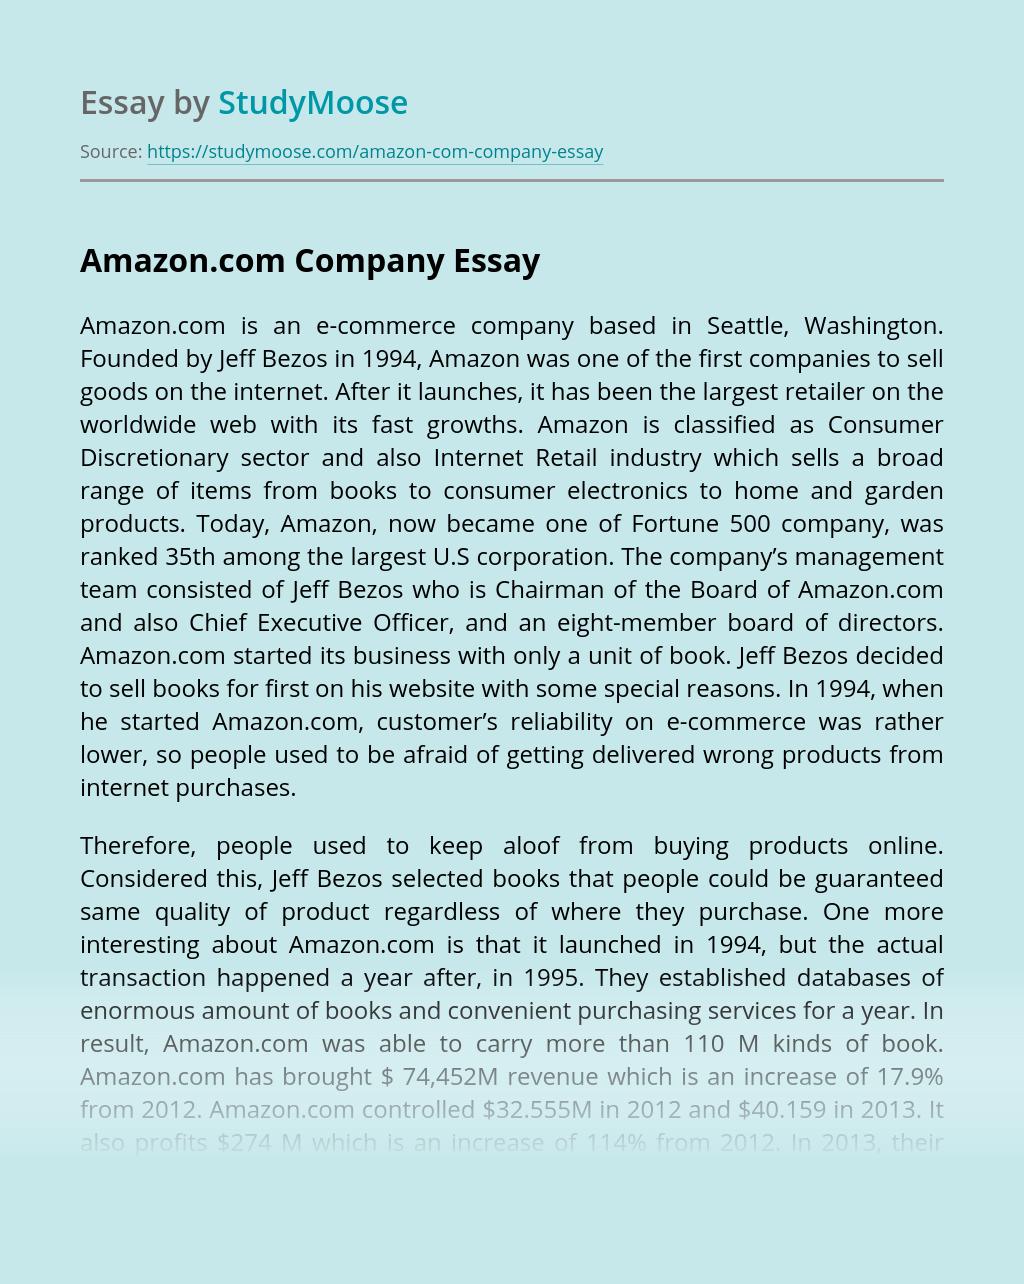 Amazon.com Company